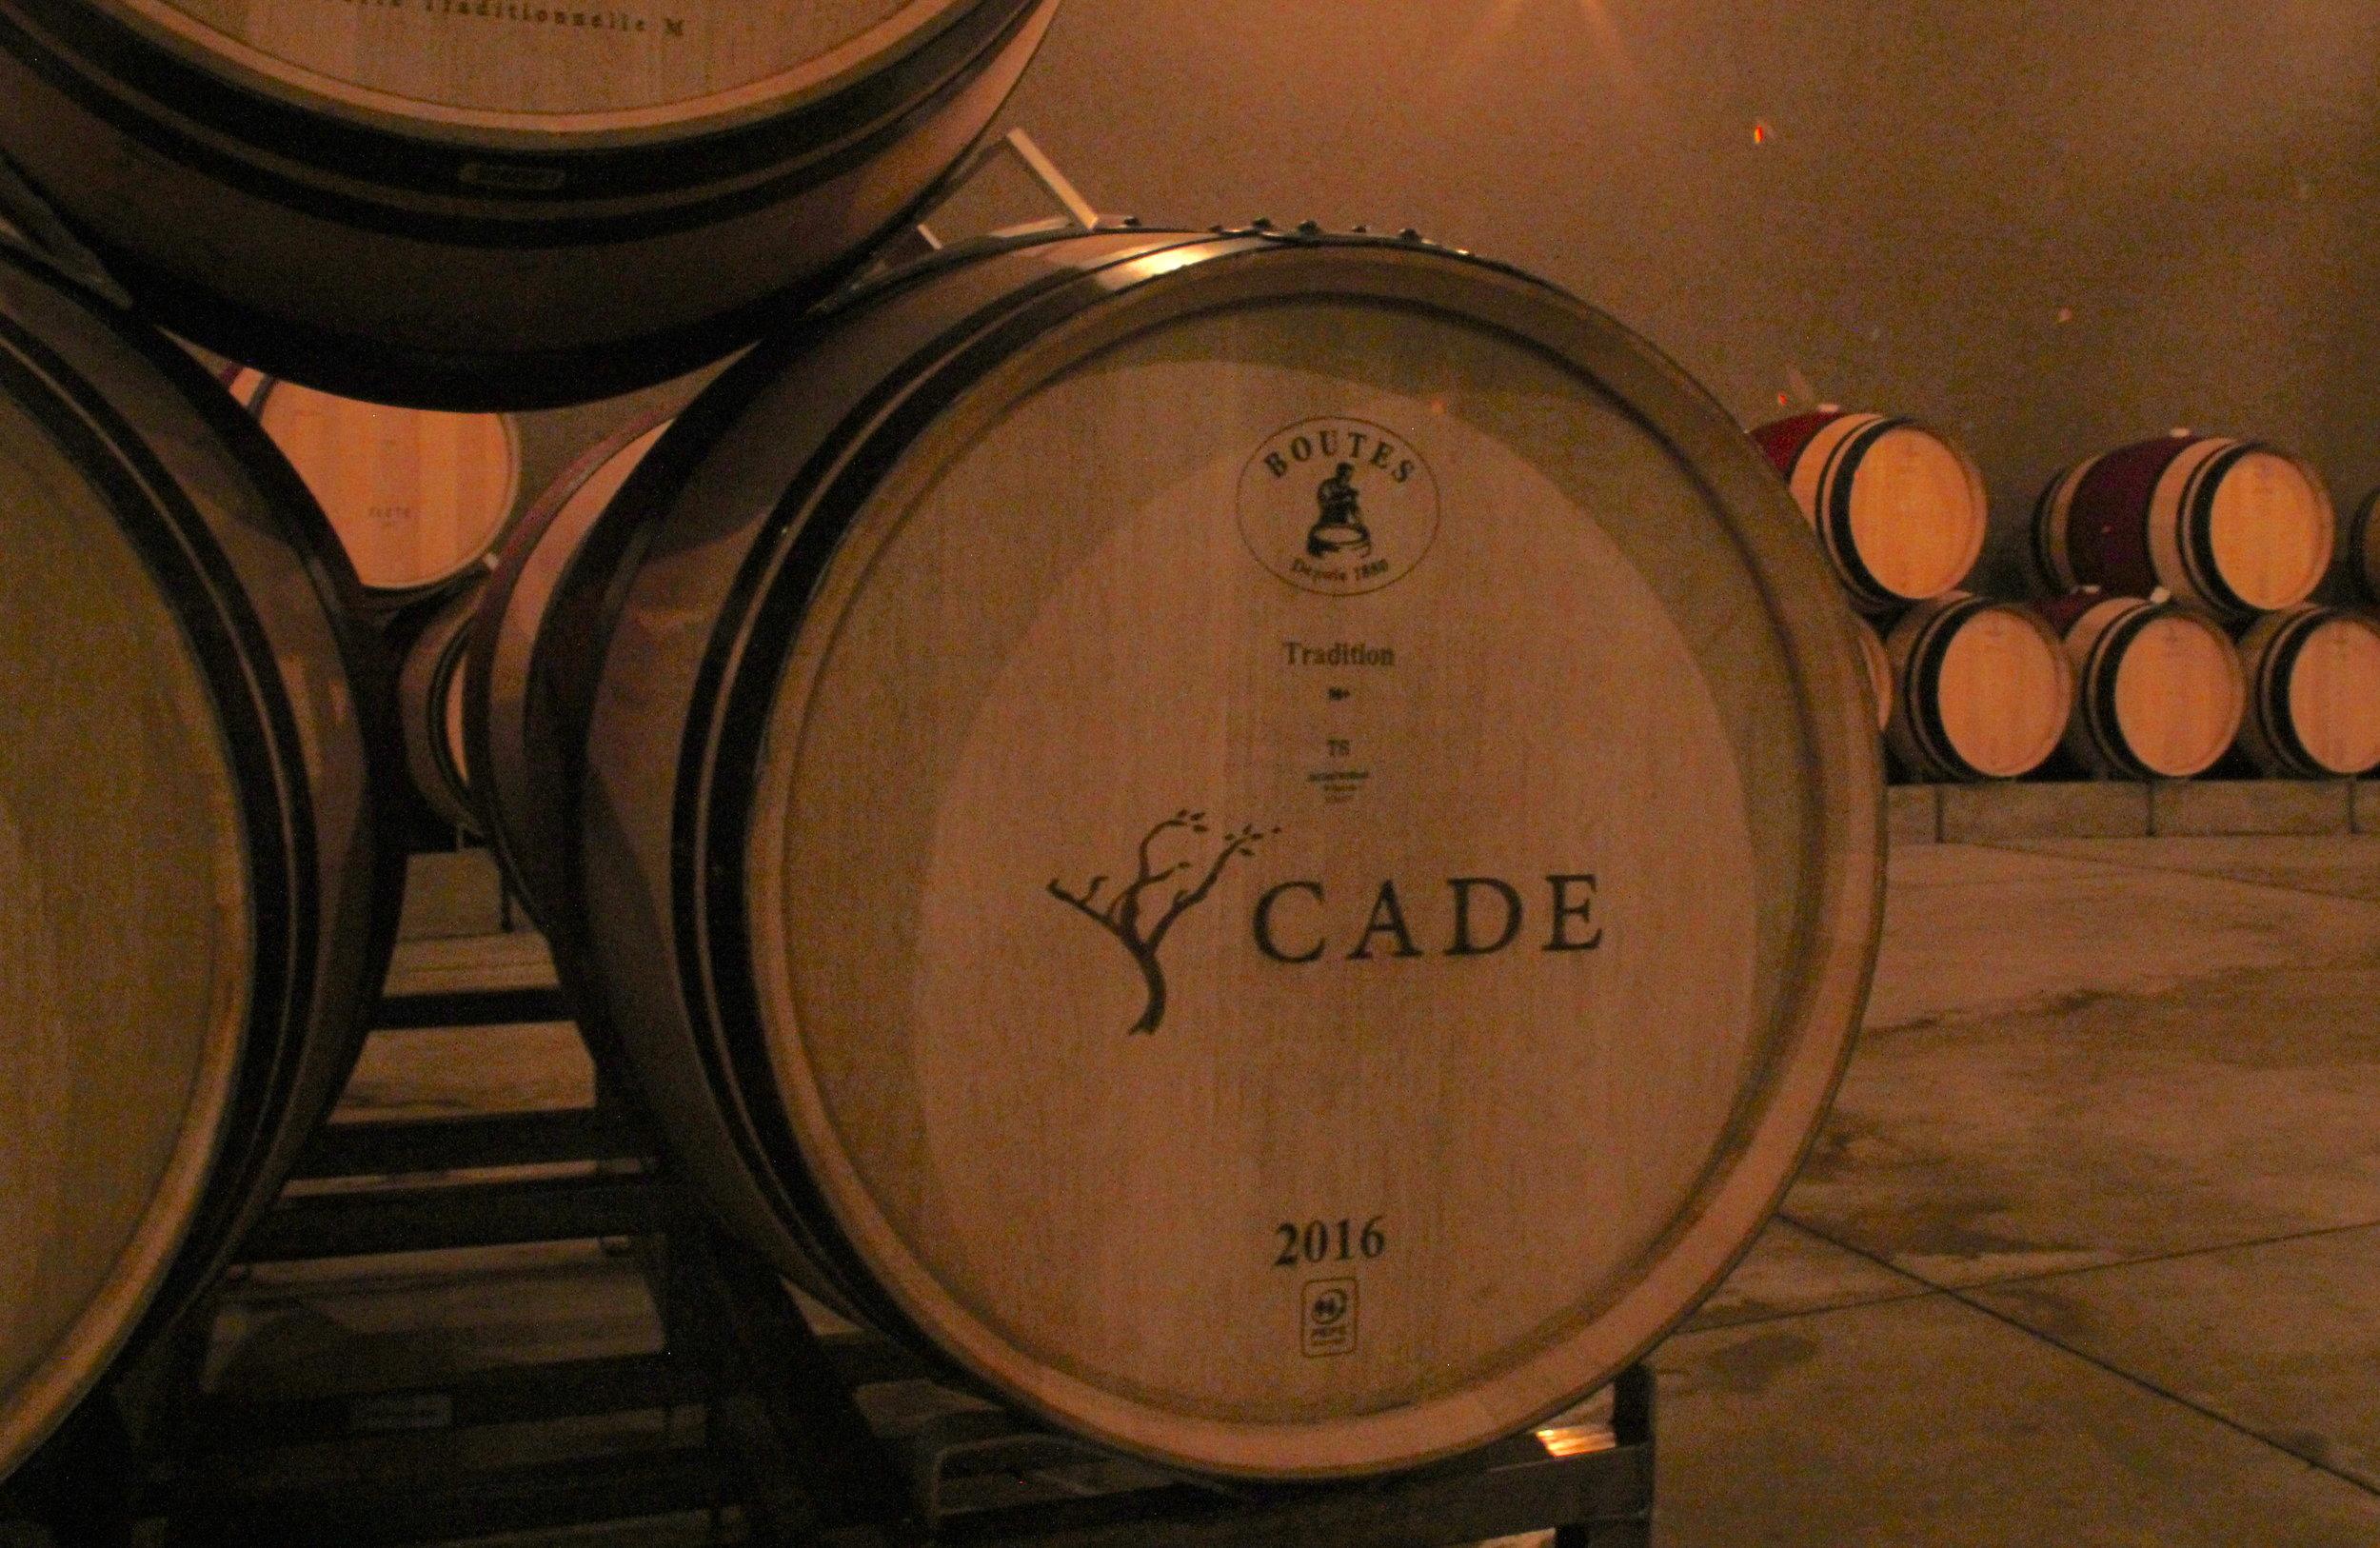 inside the Cade wine cellar